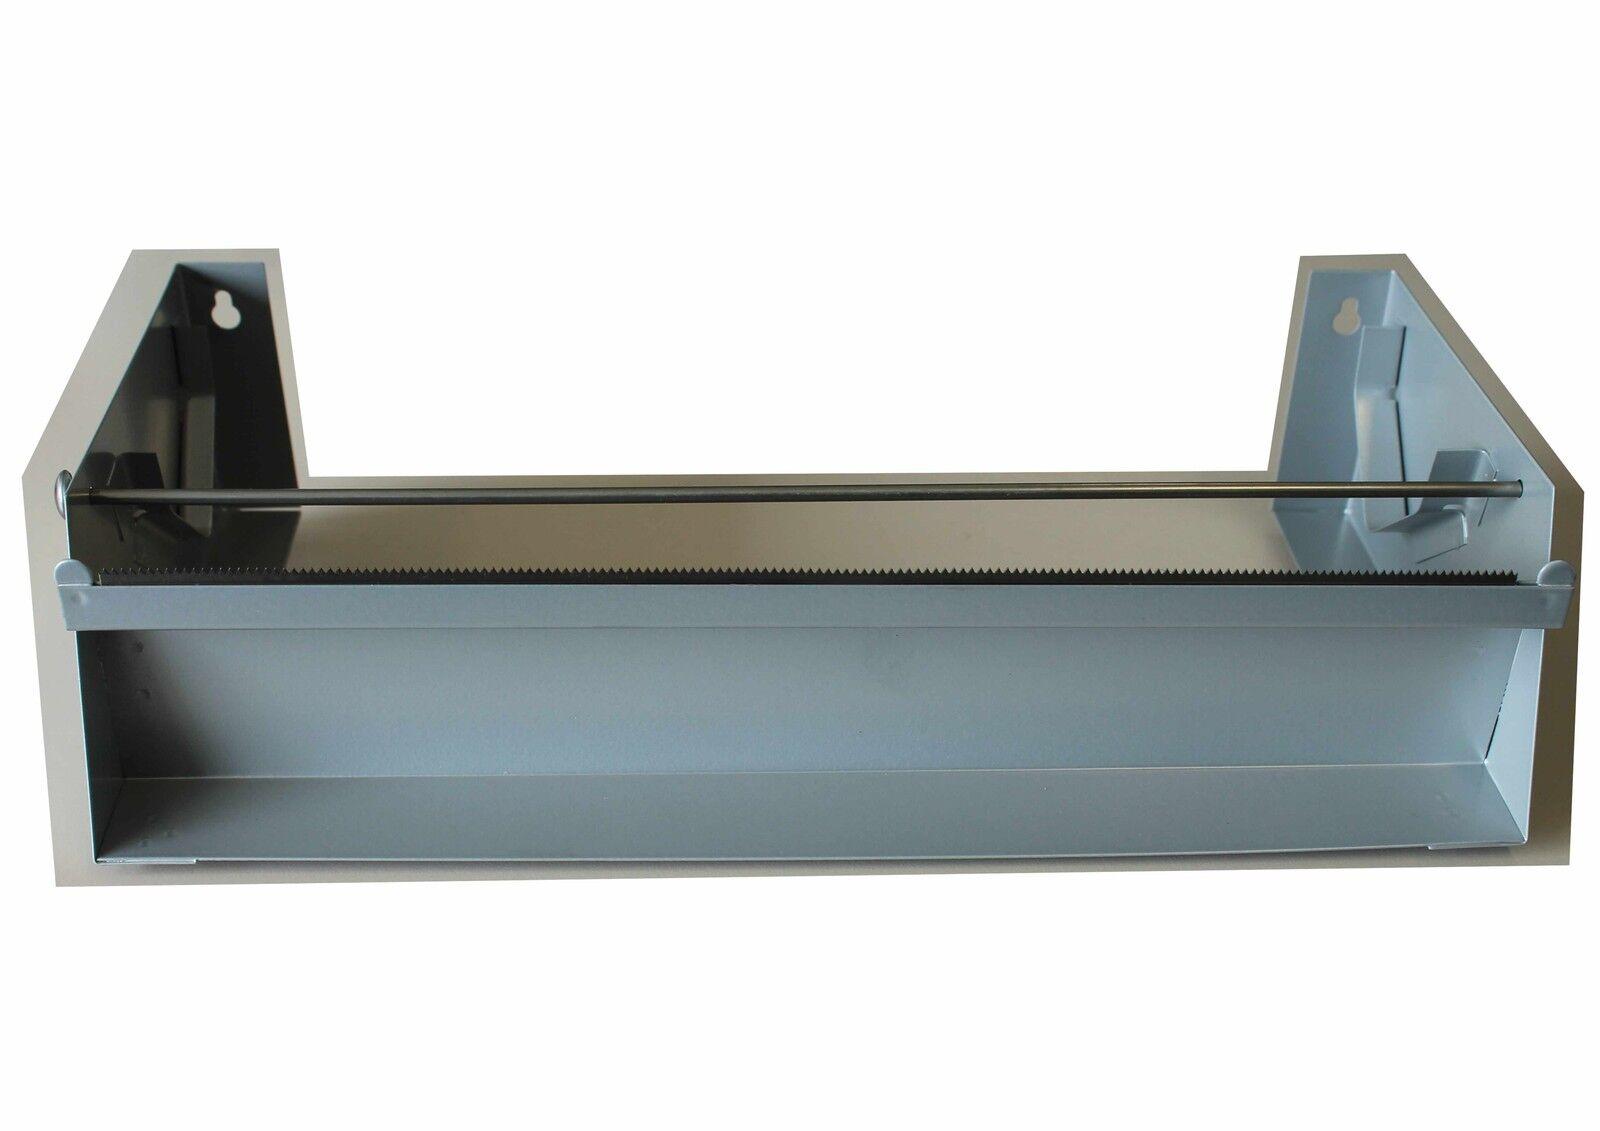 Folienspender Abrollgerät Folientrenngerät Alufolie Frischhaltefolie 45 cm